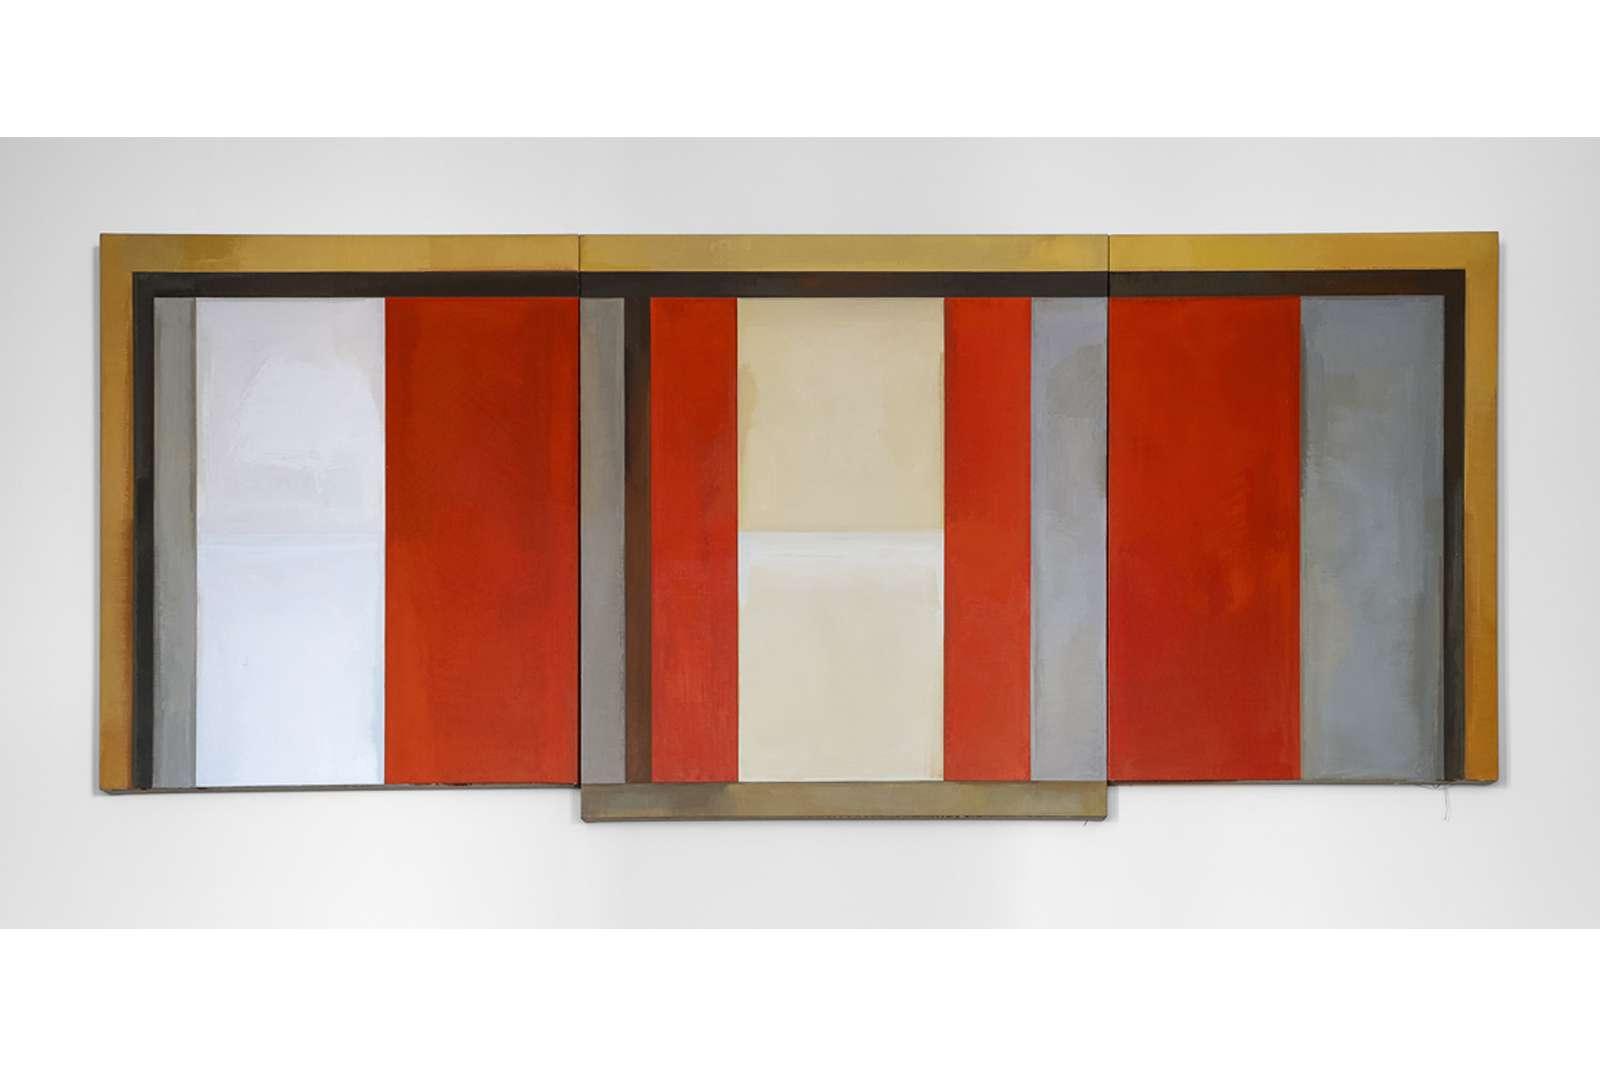 David Novros, Untitled, 1975-76.Oil on Canvas. Photo by Nash Baker.